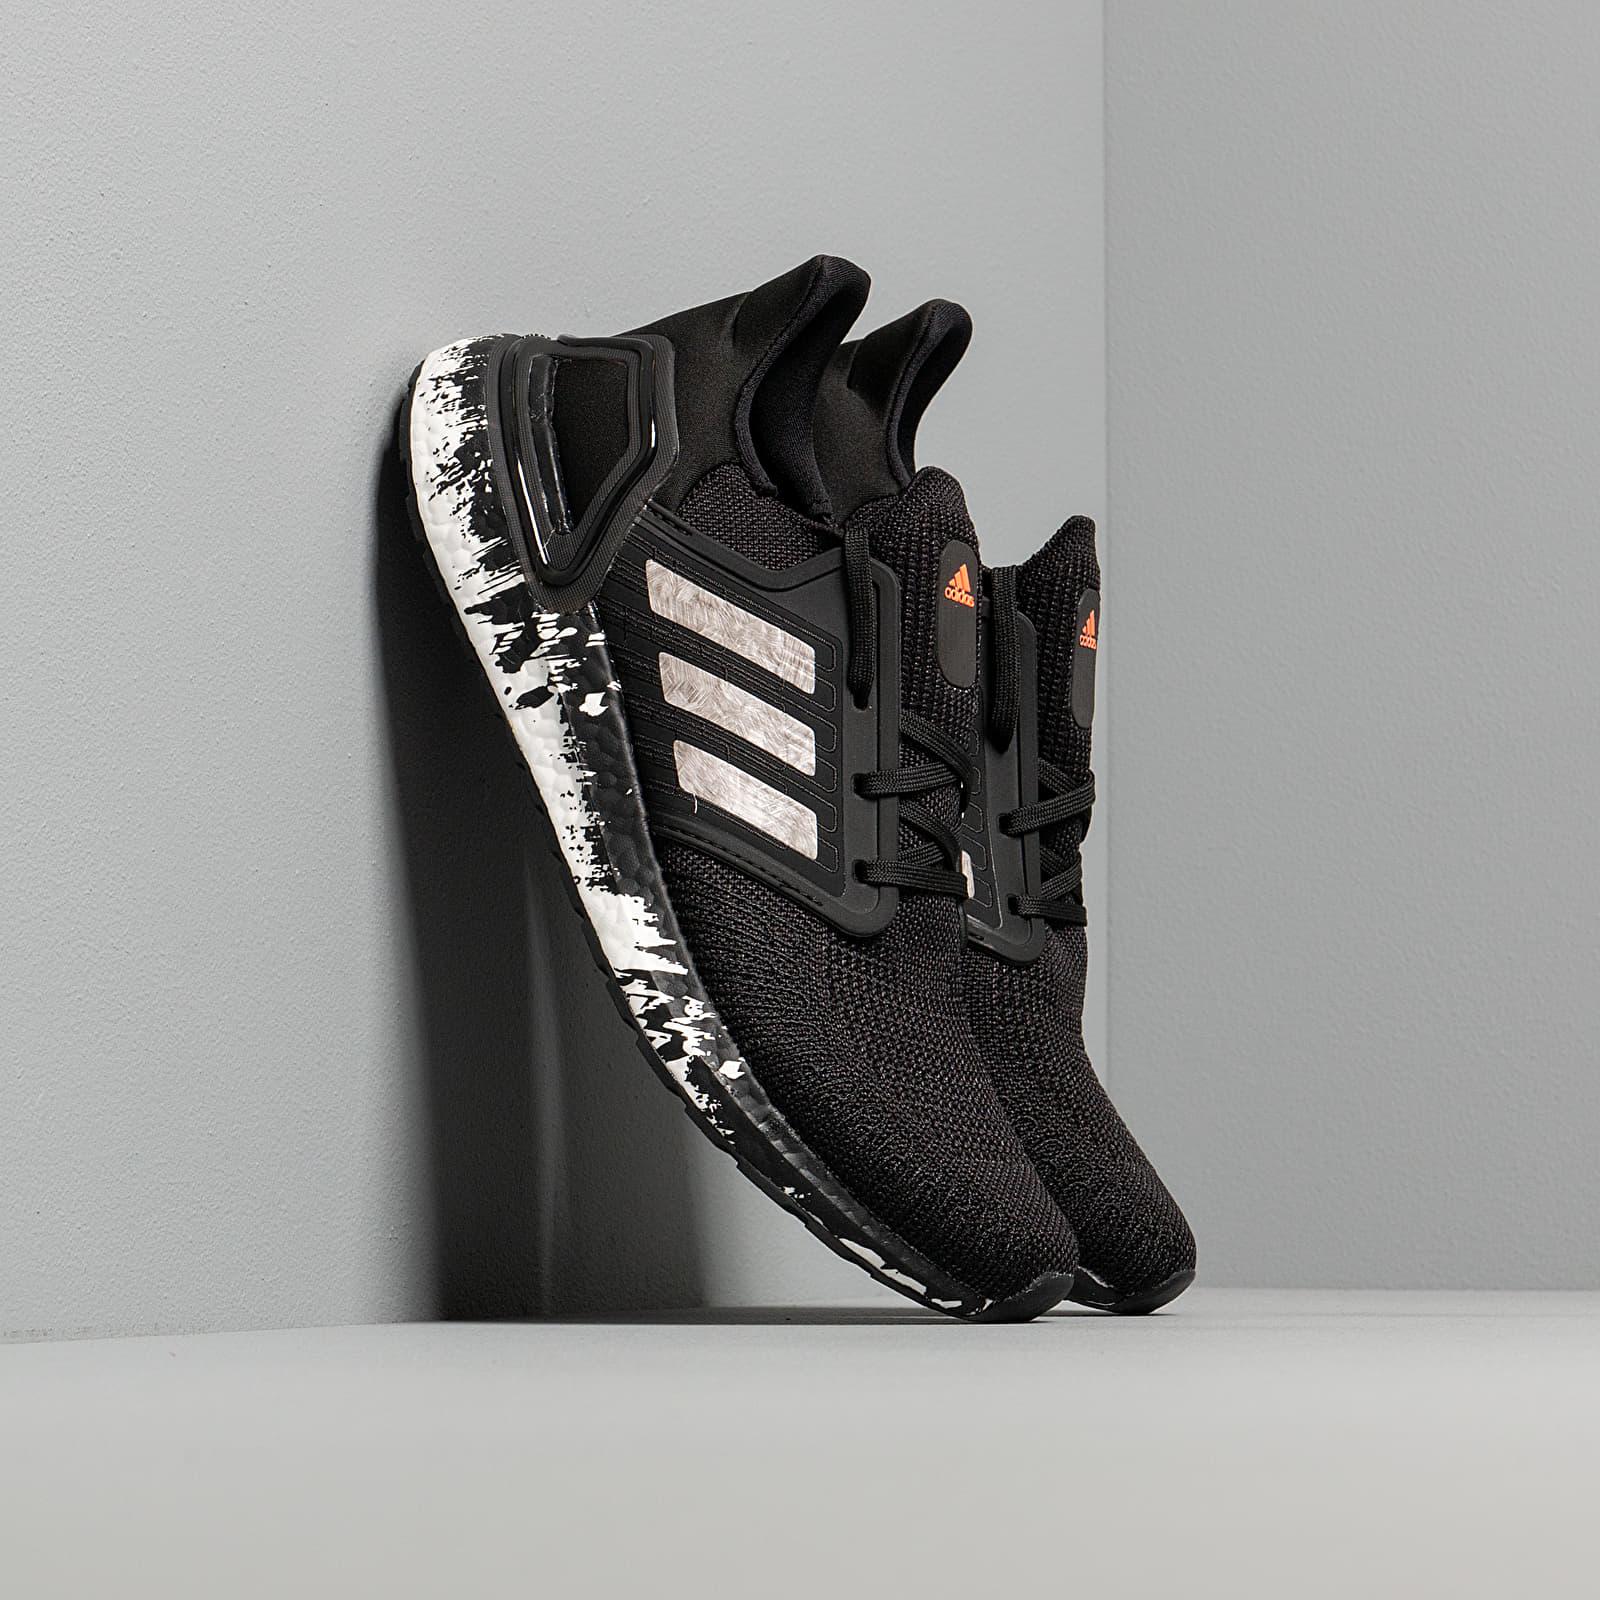 Férfi cipők adidas UltraBOOST 20 Core Black/ Ftw White/ Signature Coral